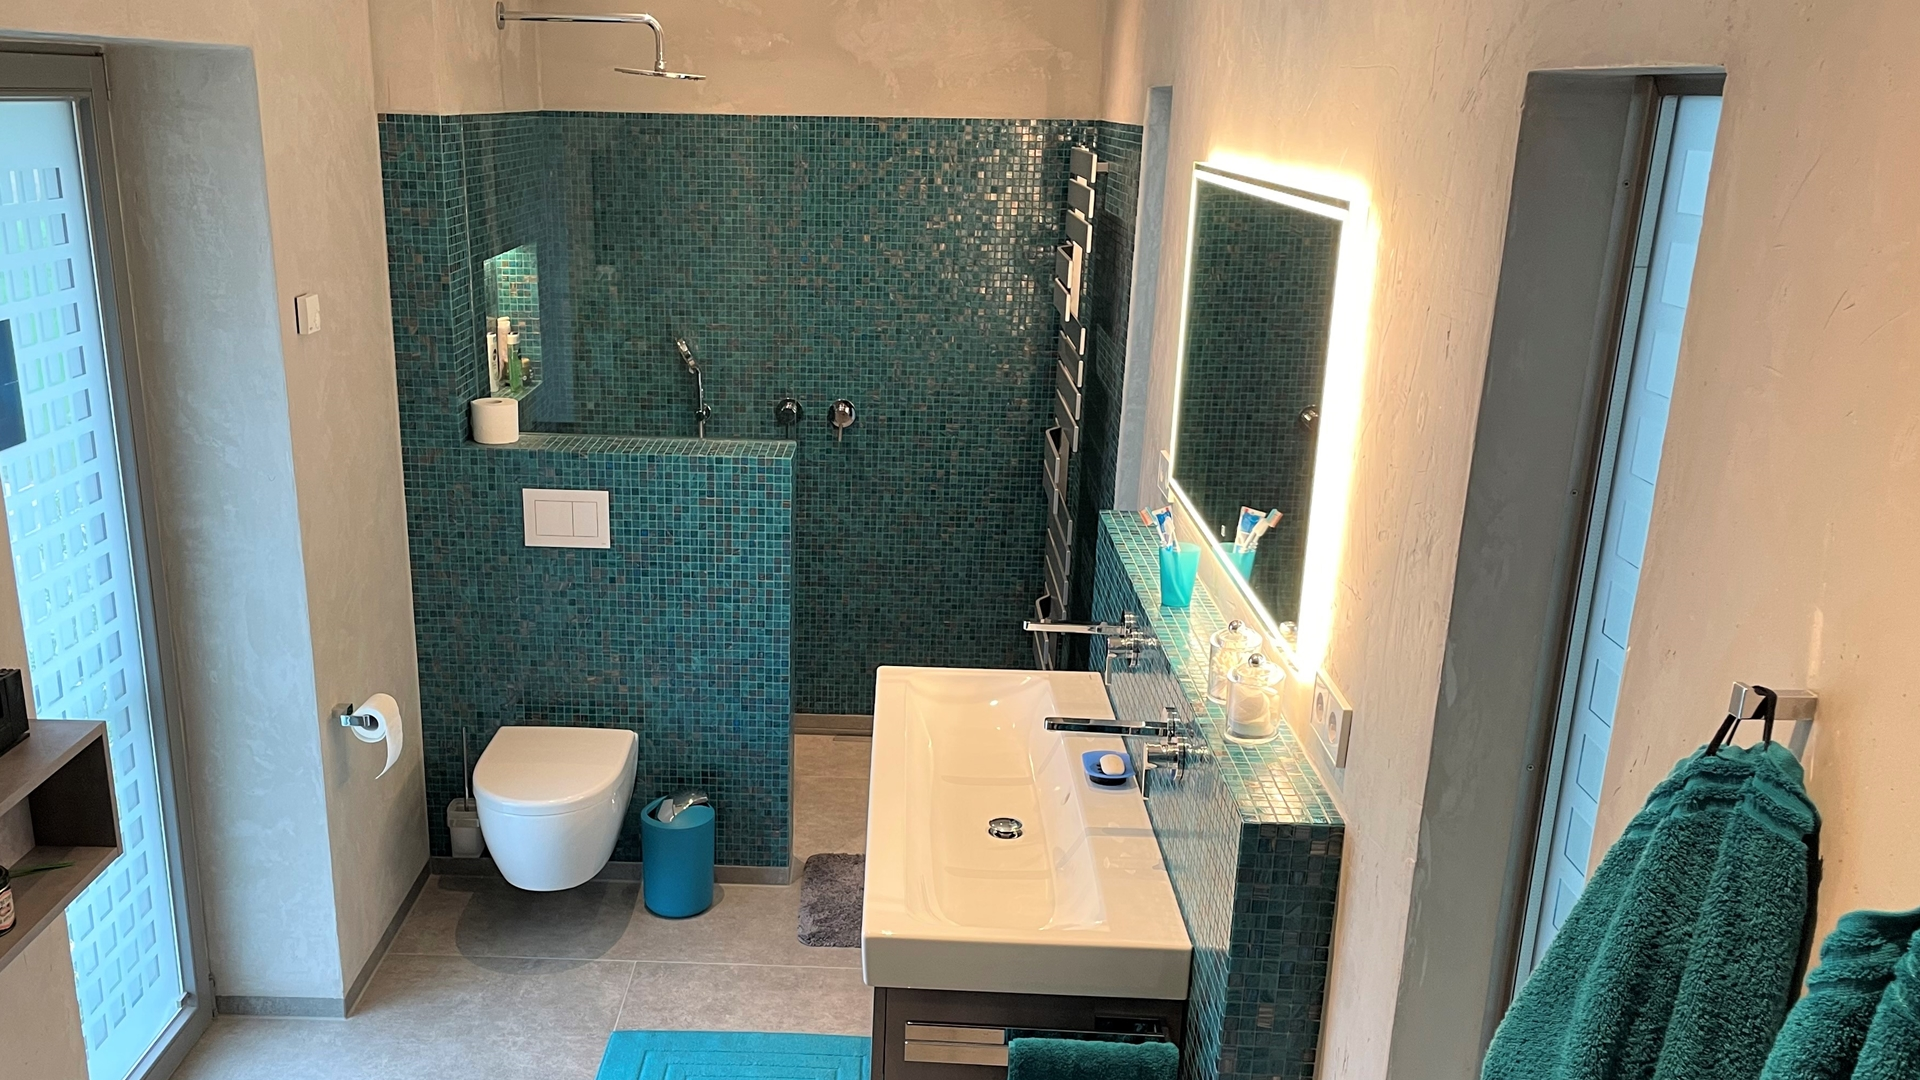 Bad in tuerkis und betonoptik in Dorsten